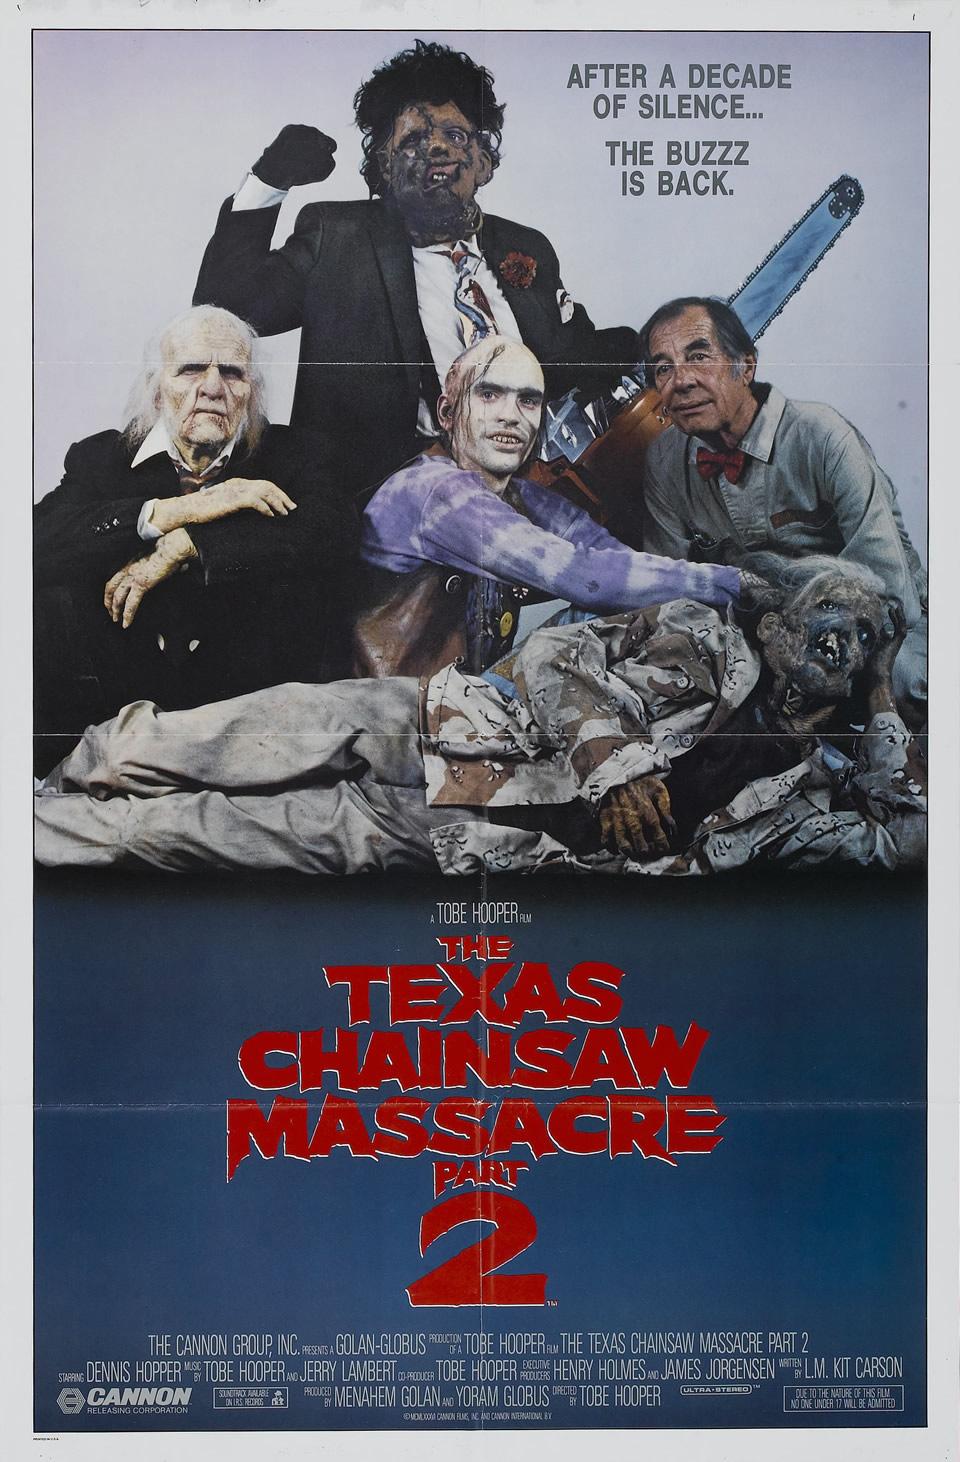 The Texas Chainsaw Massacre Part 2 (1986)